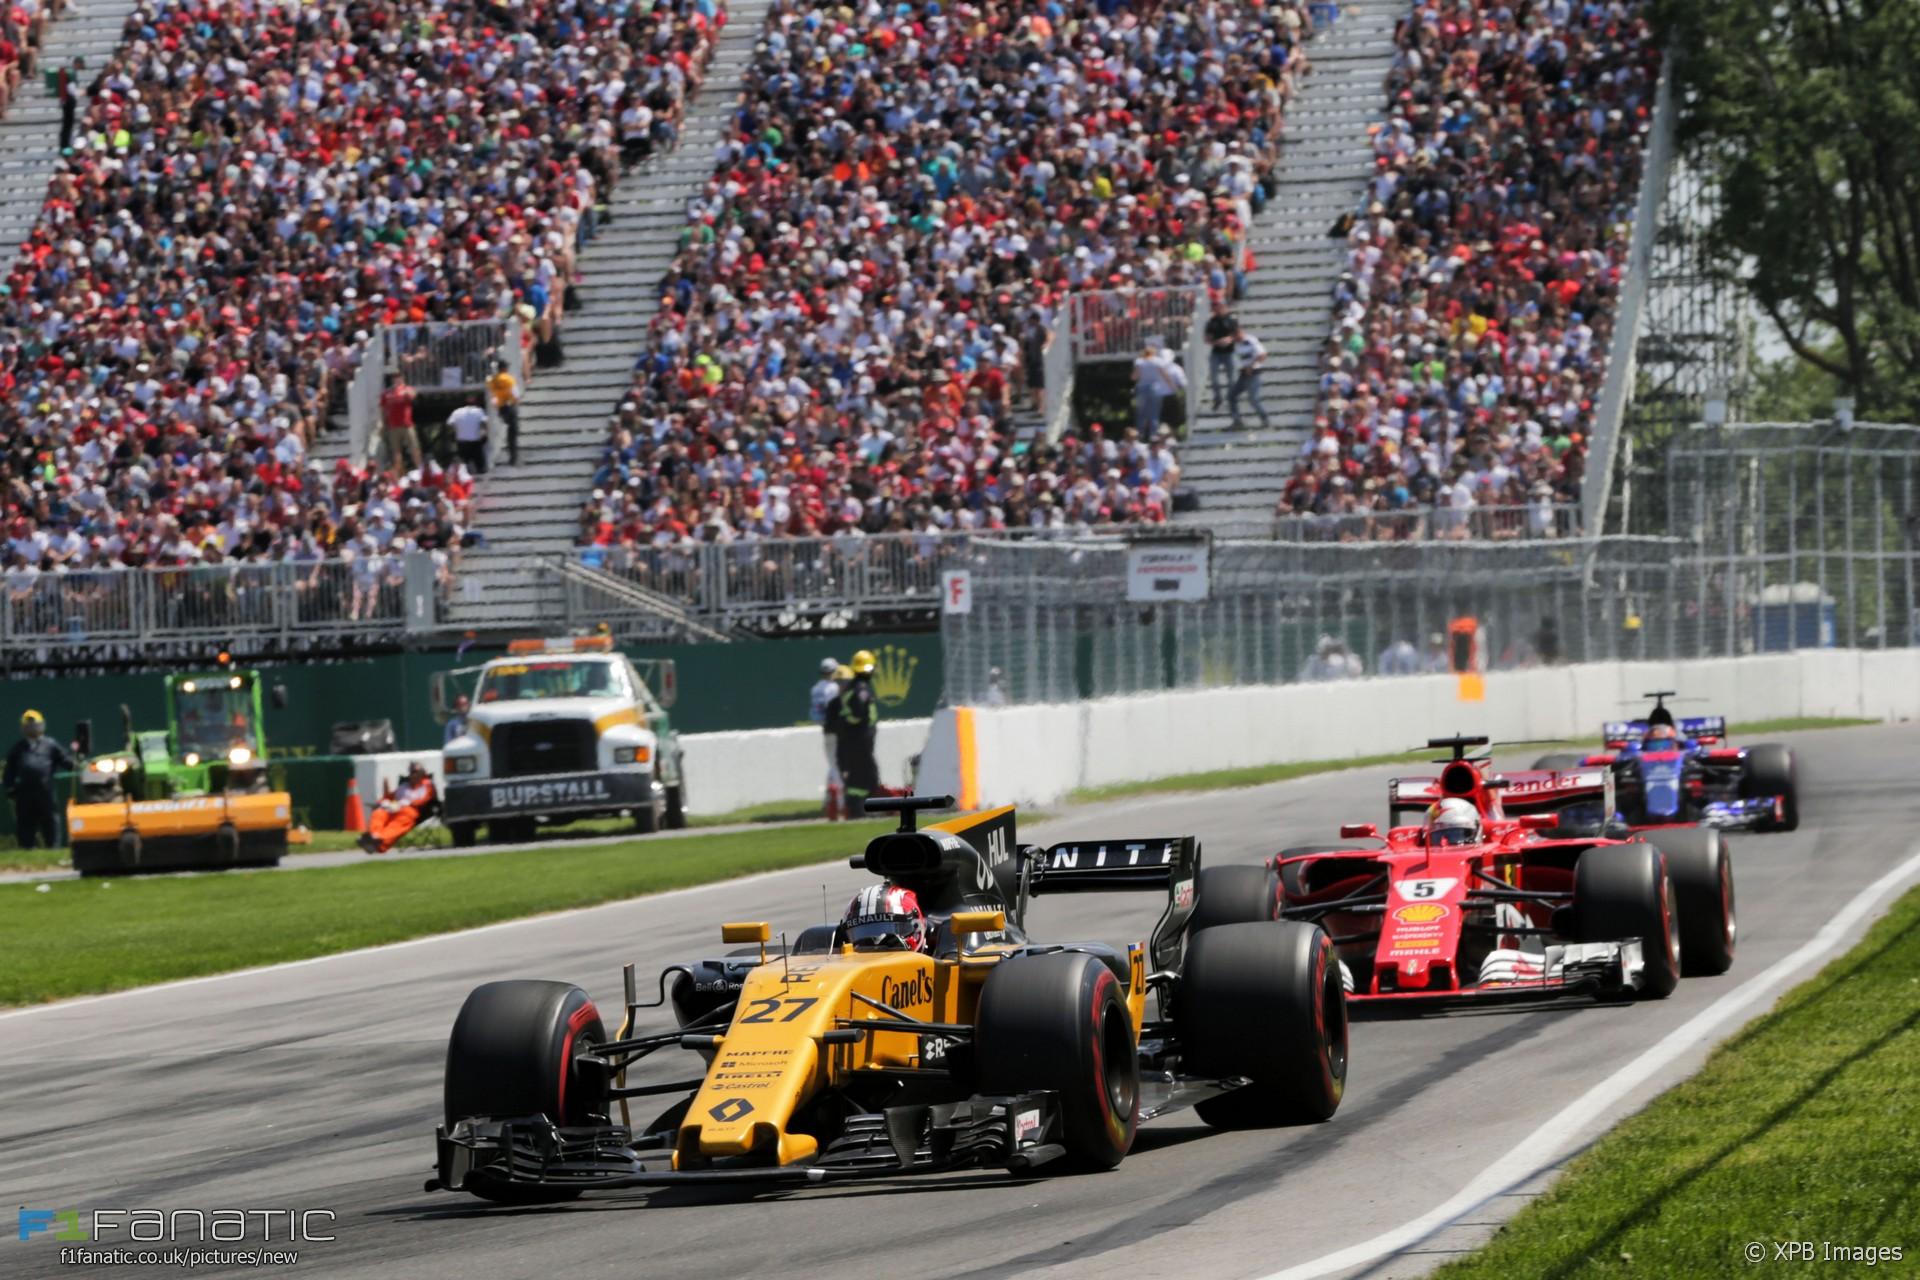 Nico Hulkenberg, Renault, Circuit Gilles Villeneuve, 2017